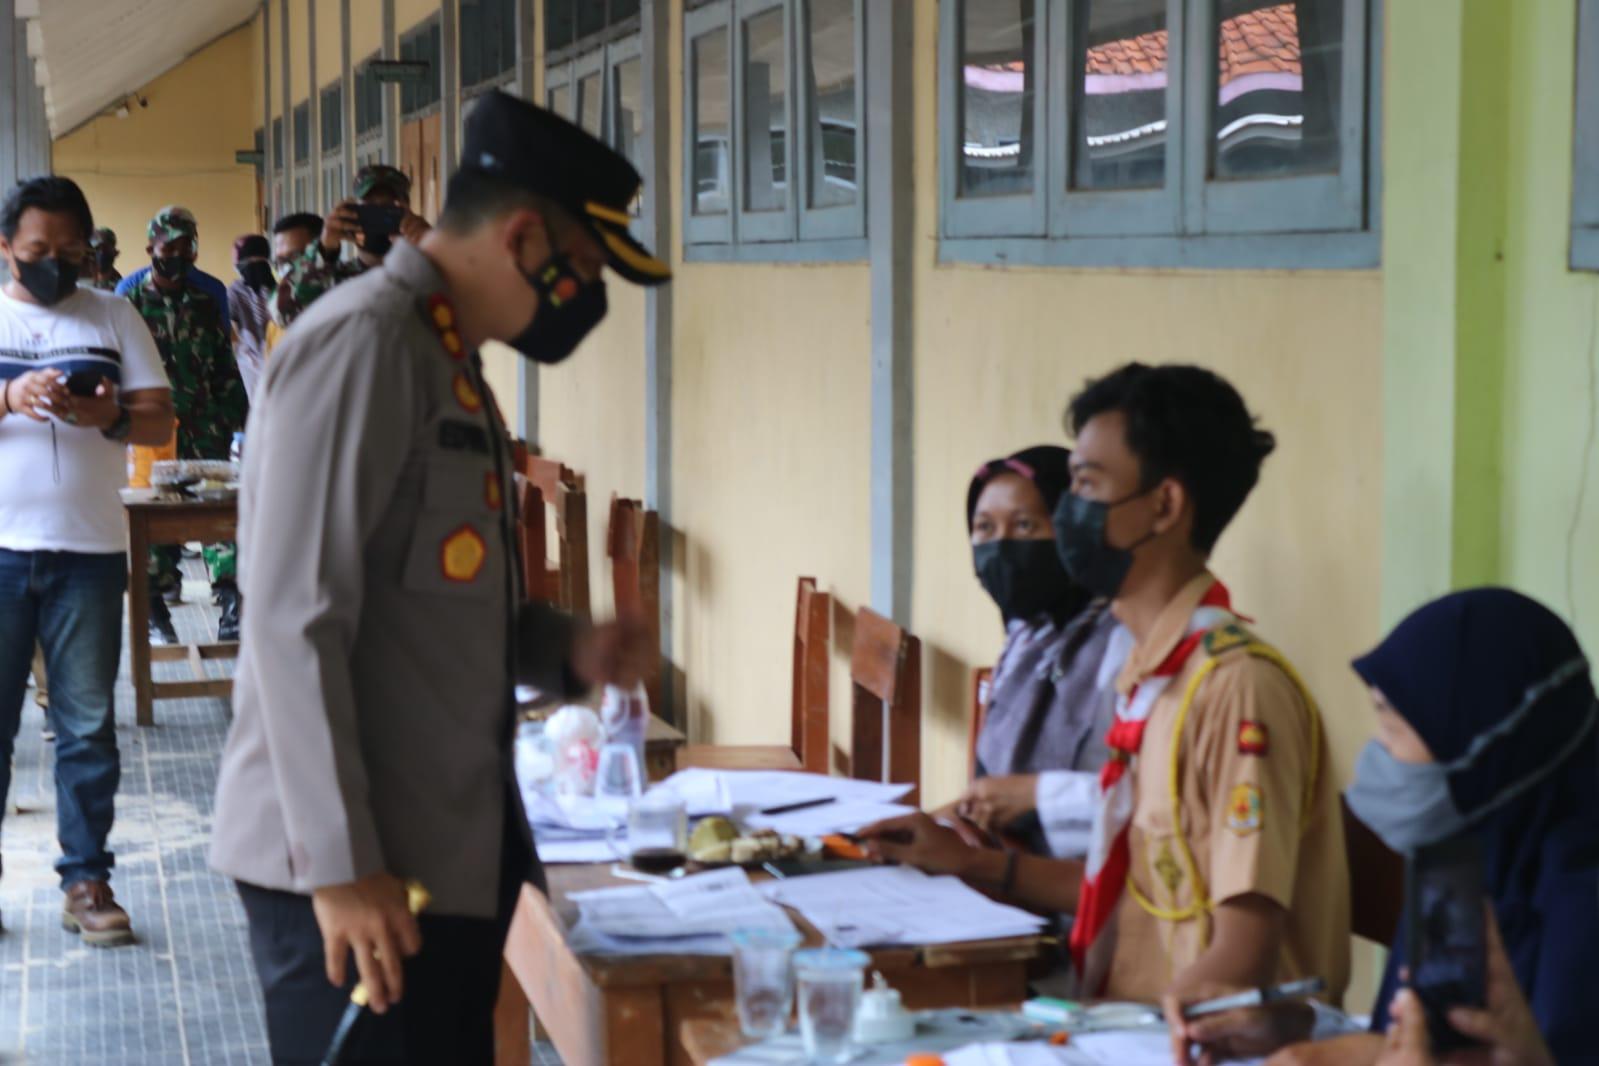 Kapolres Majalengka Monitoring Pelaksanaan Vaksinasi Bagi Para Siswa-Siswi SMK Tridaya Budi